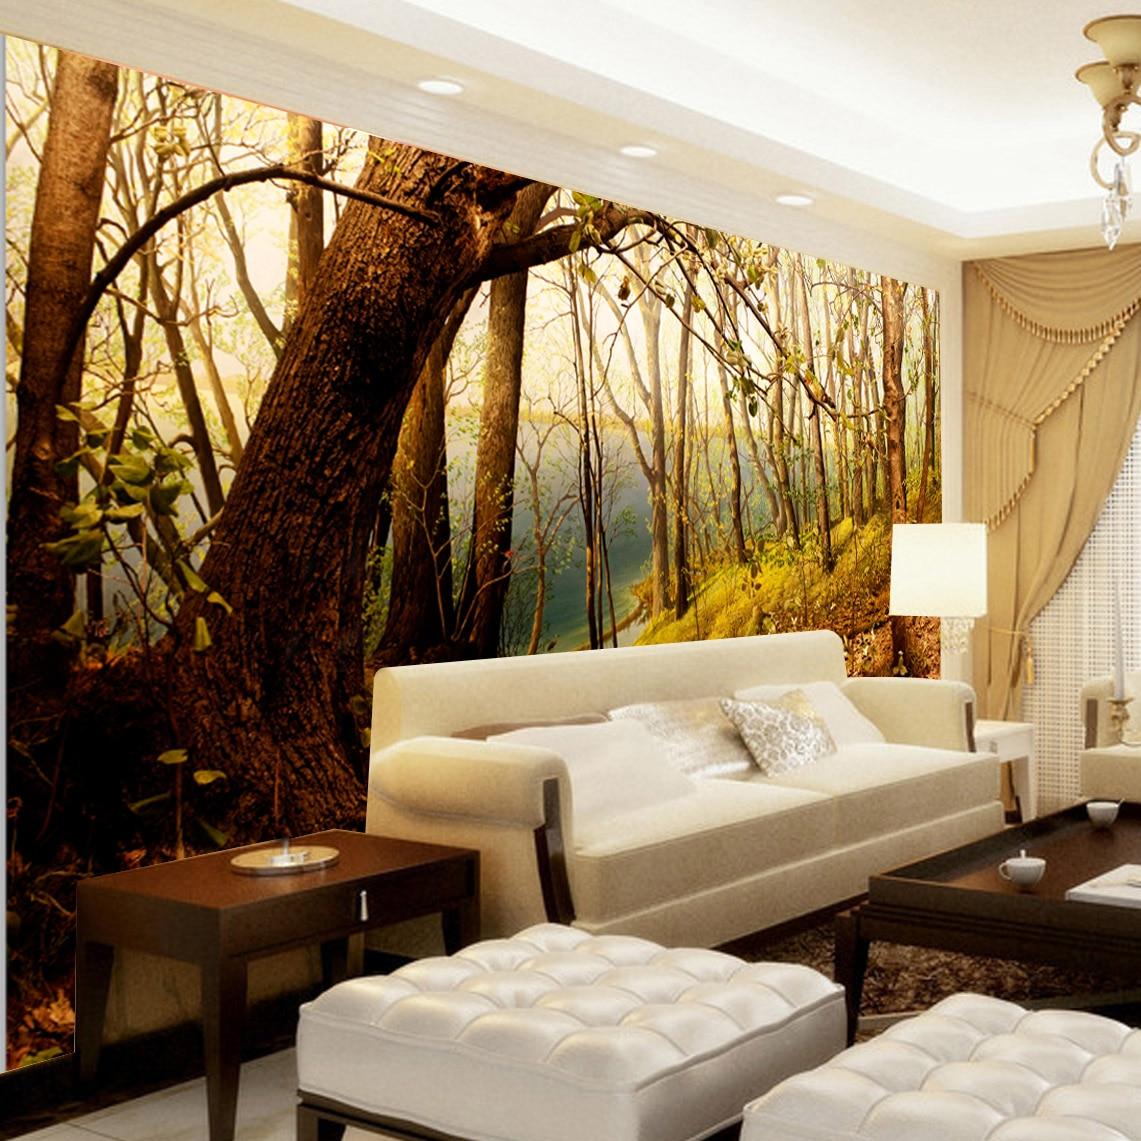 home decor art large Mural walls tv wall sofa background custom wallpaper 3d bedroom cafe bars woods, dusk,romantic photo fresco цена и фото